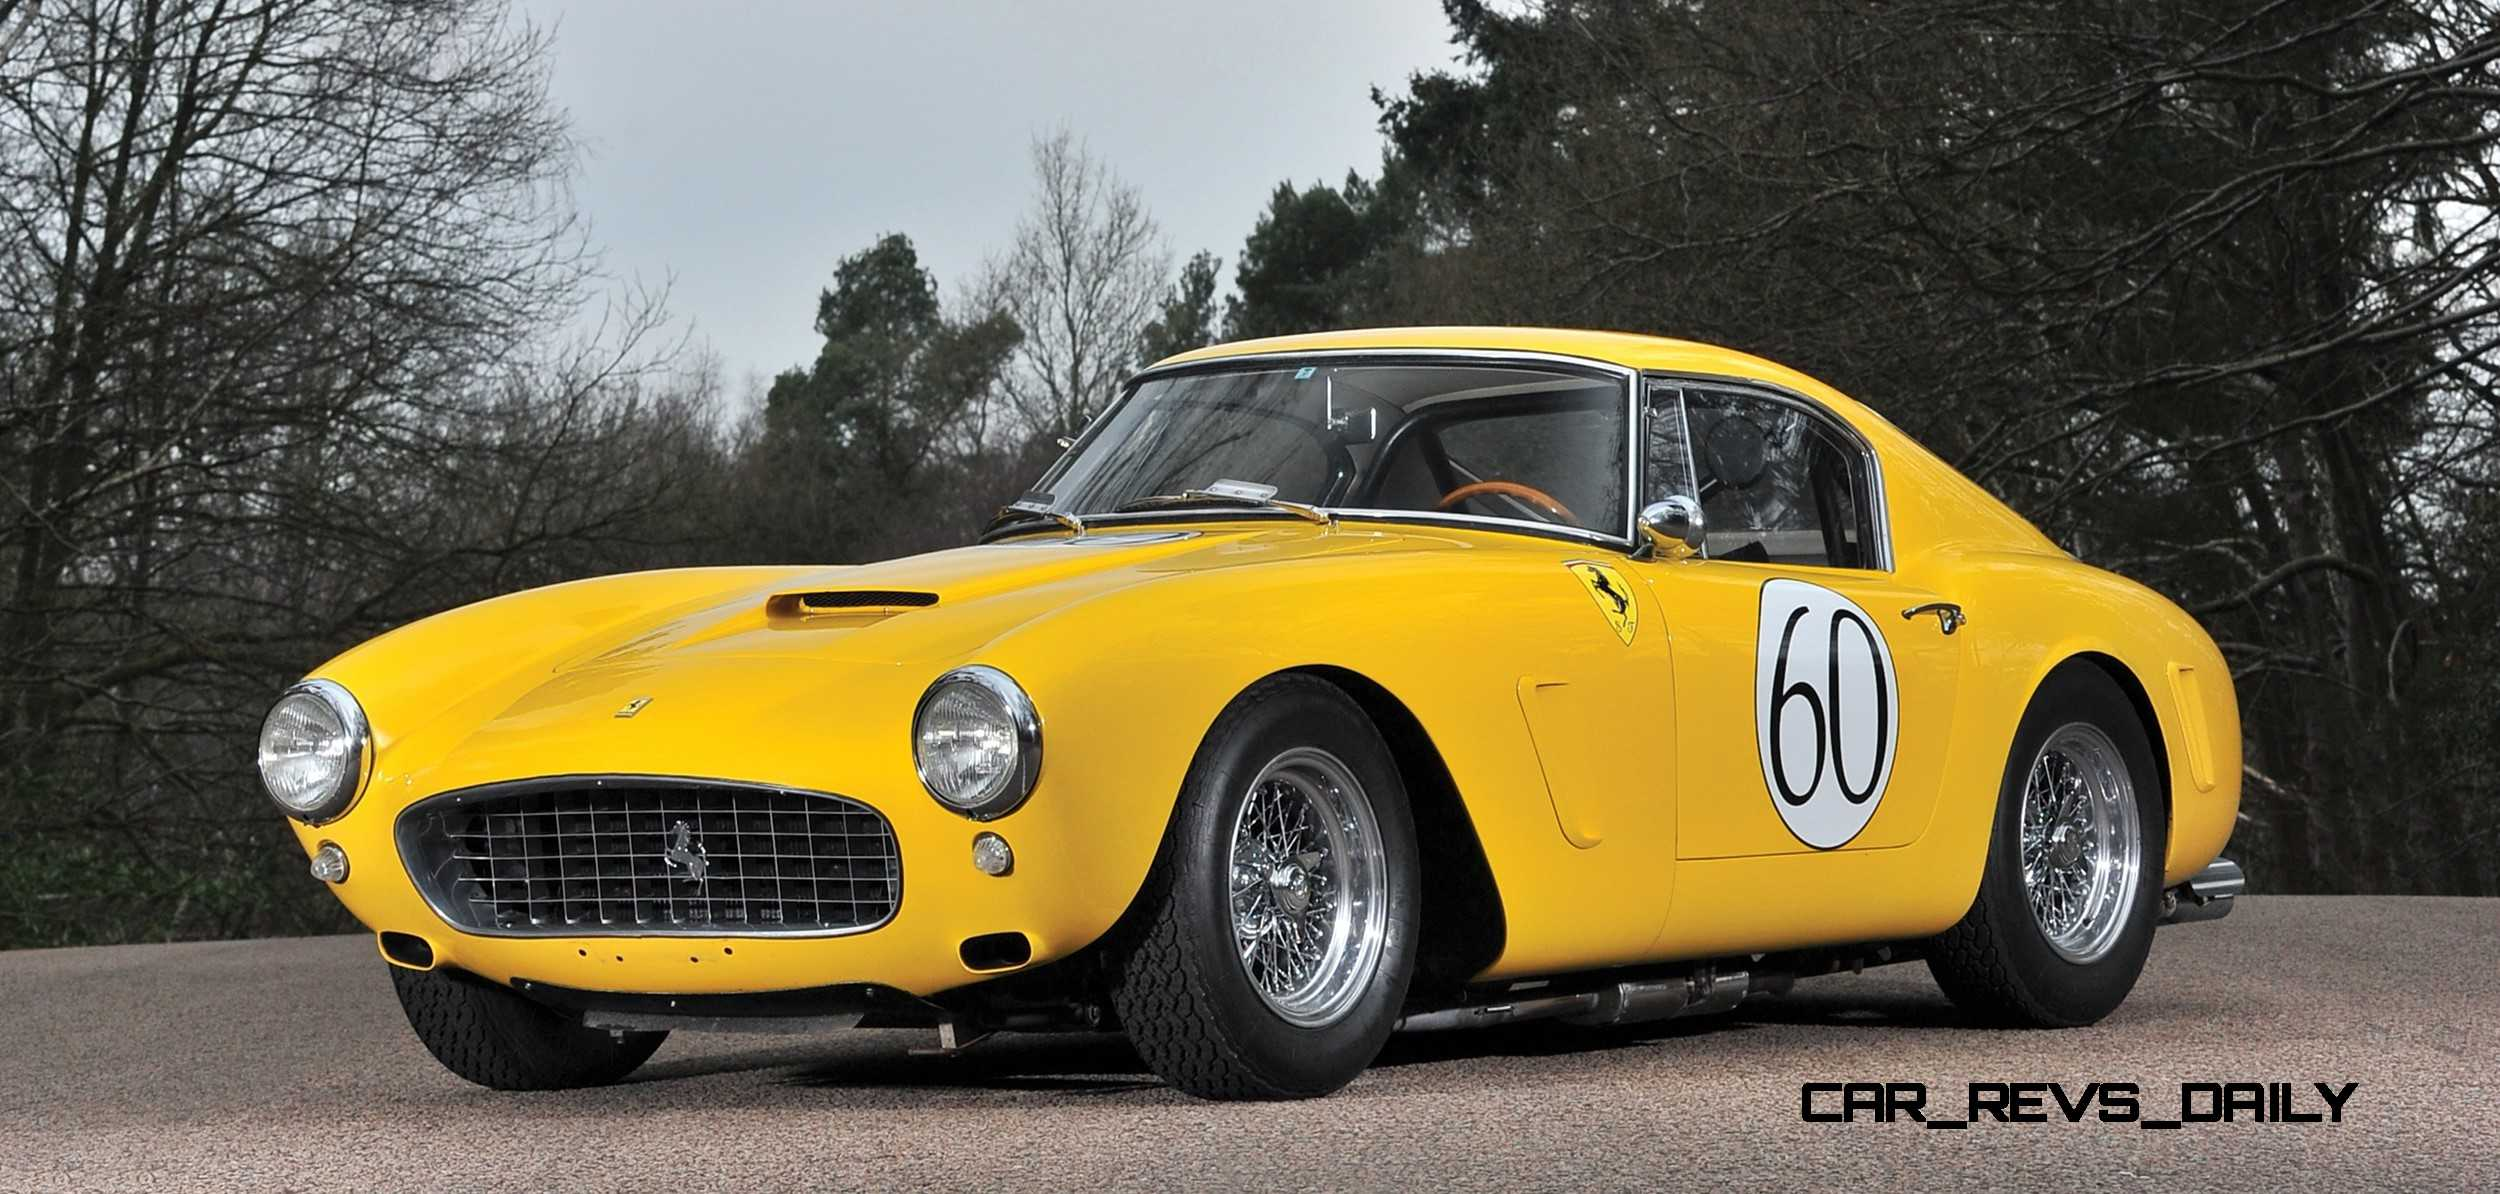 1960 Ferrari 250gt Berlinetta Competizione